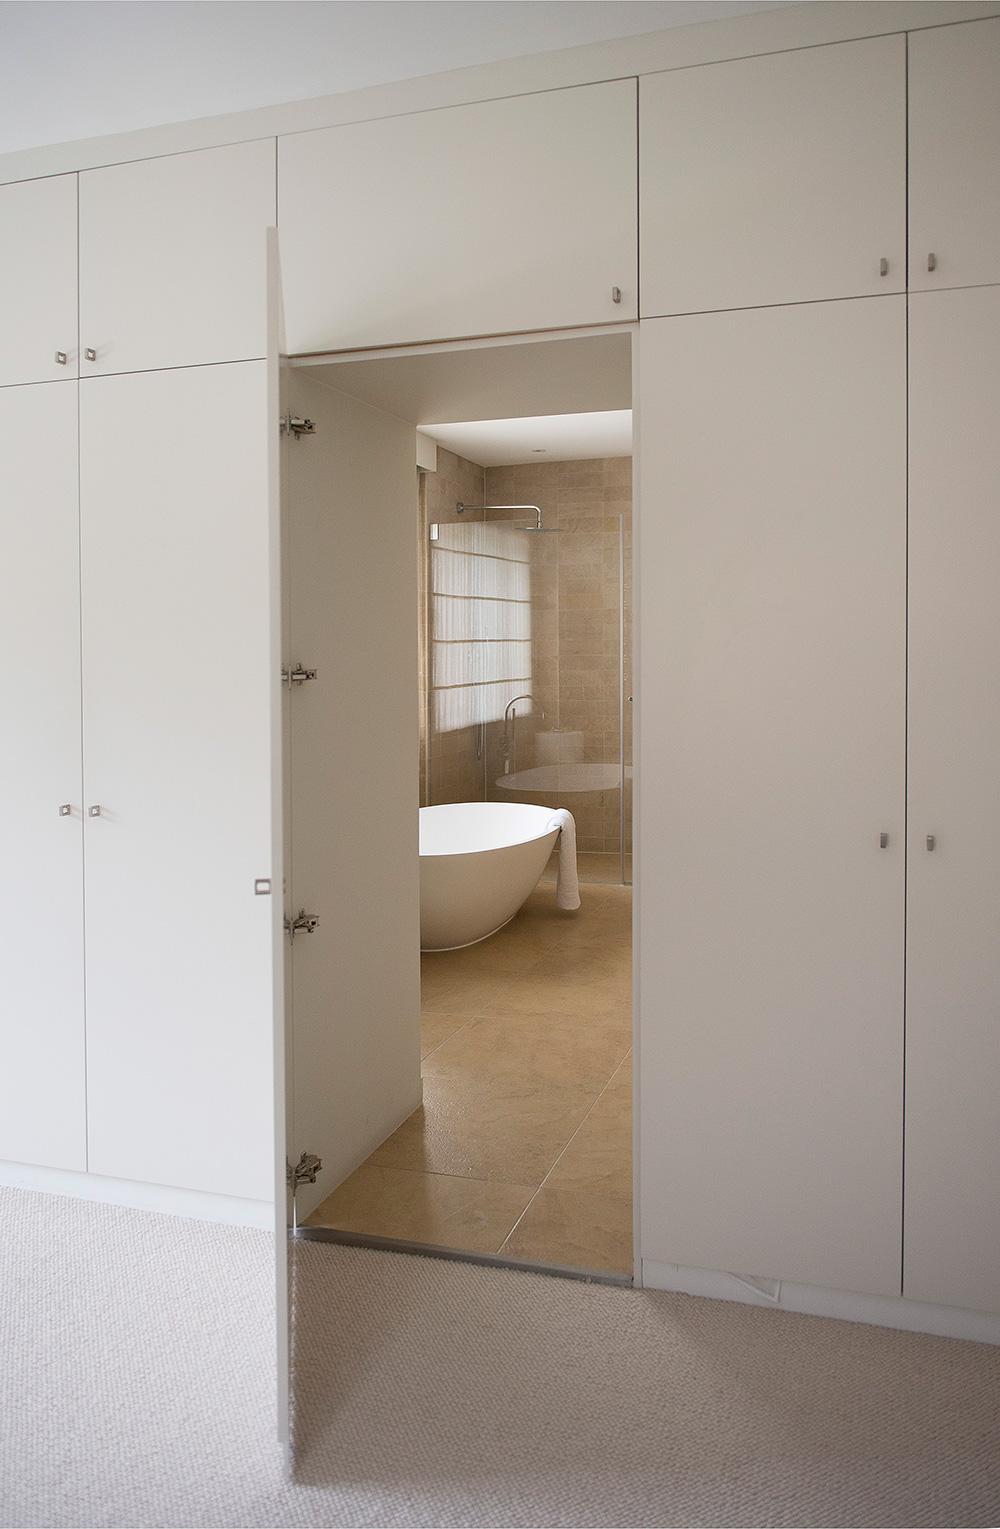 12-Nikki-Rees-hidden-En-suite-interior-design-wimbledon-london-surrey